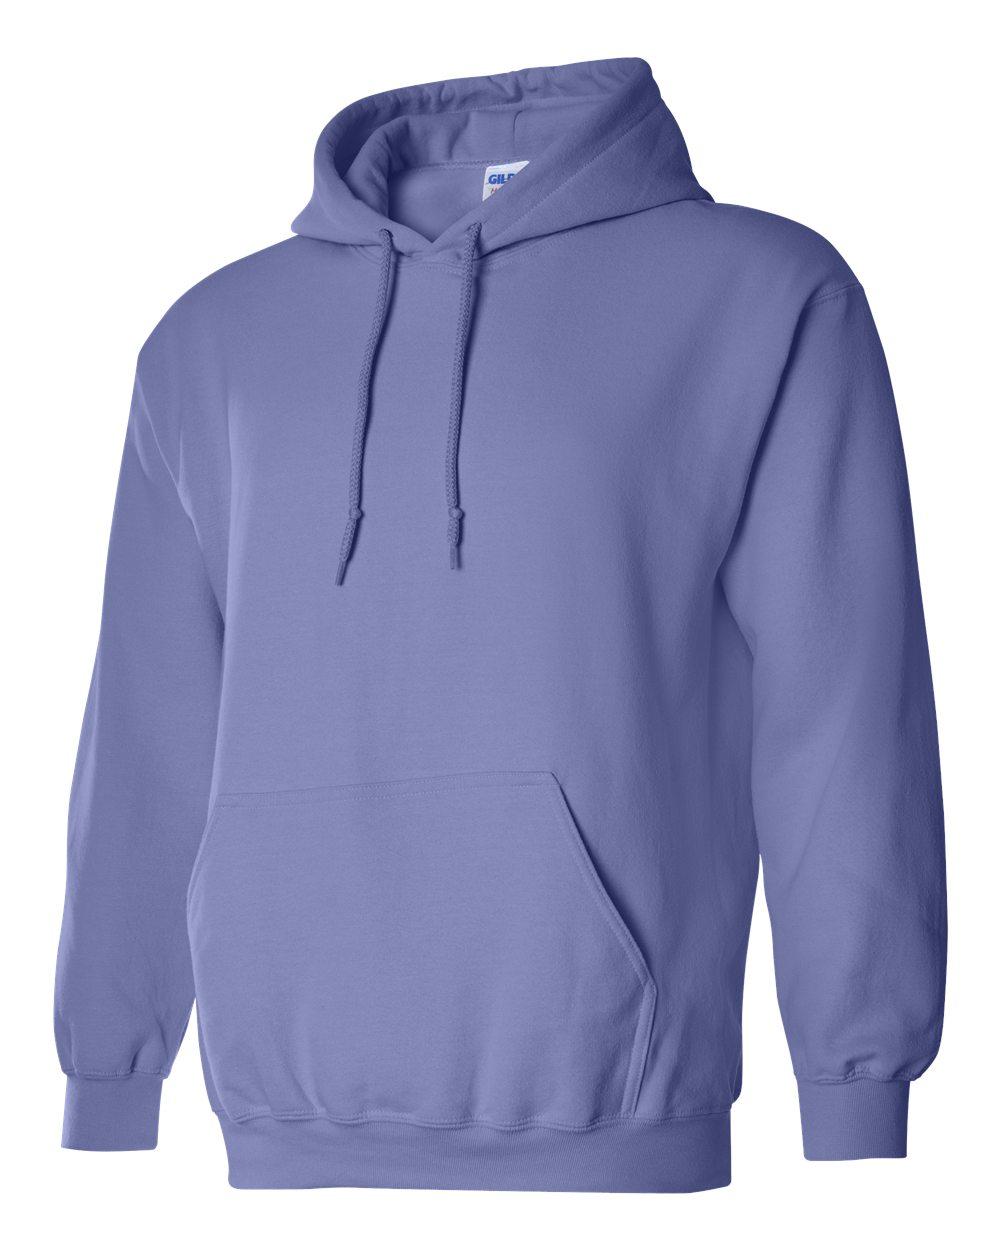 Gildan Heavy Blend Hooded Sweatshirt GI18500 Violet